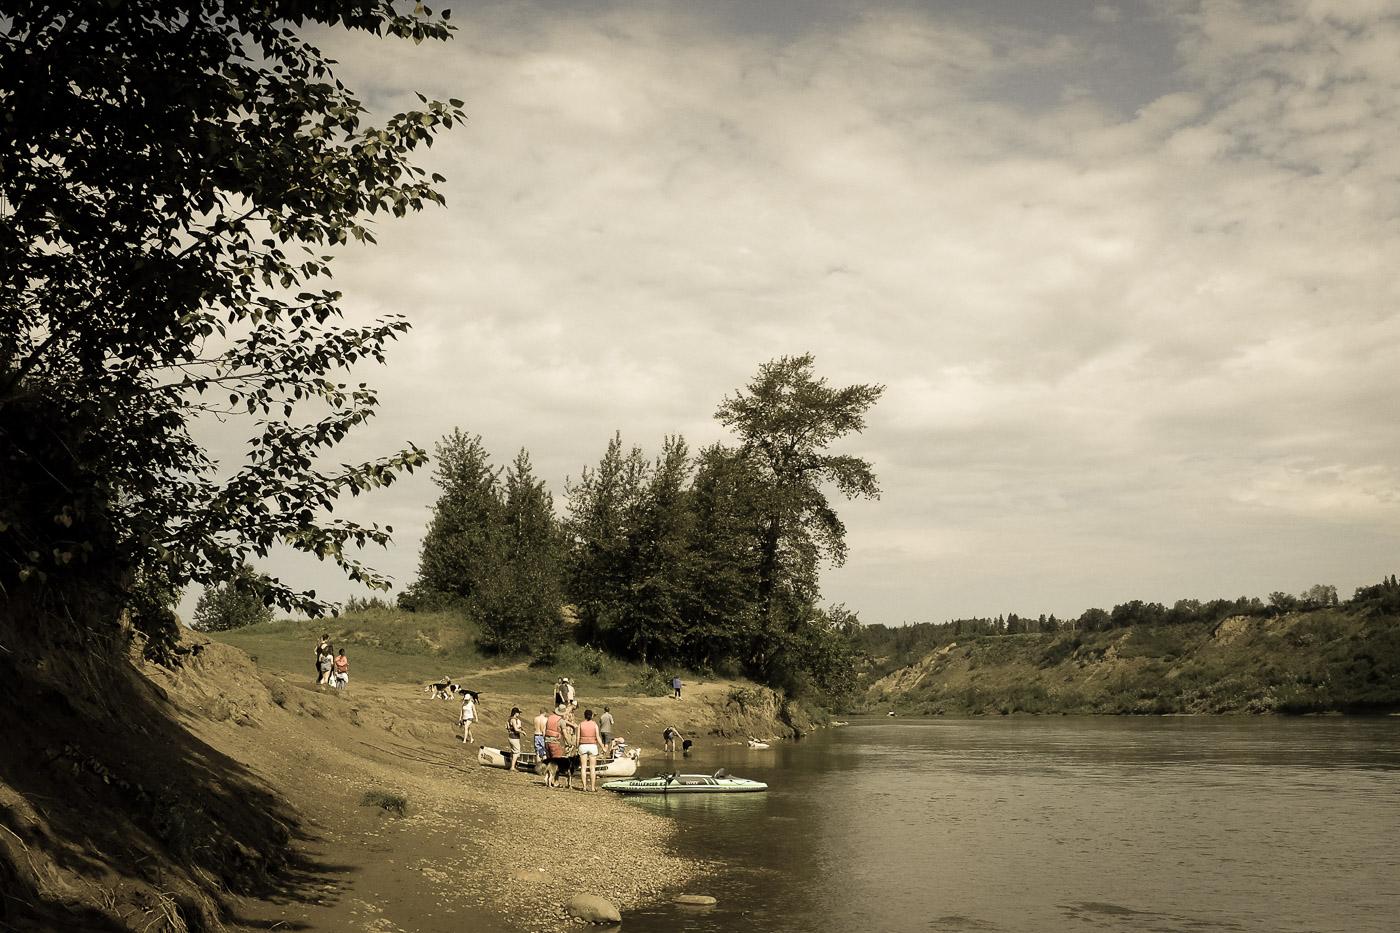 hb images - river edge - 8